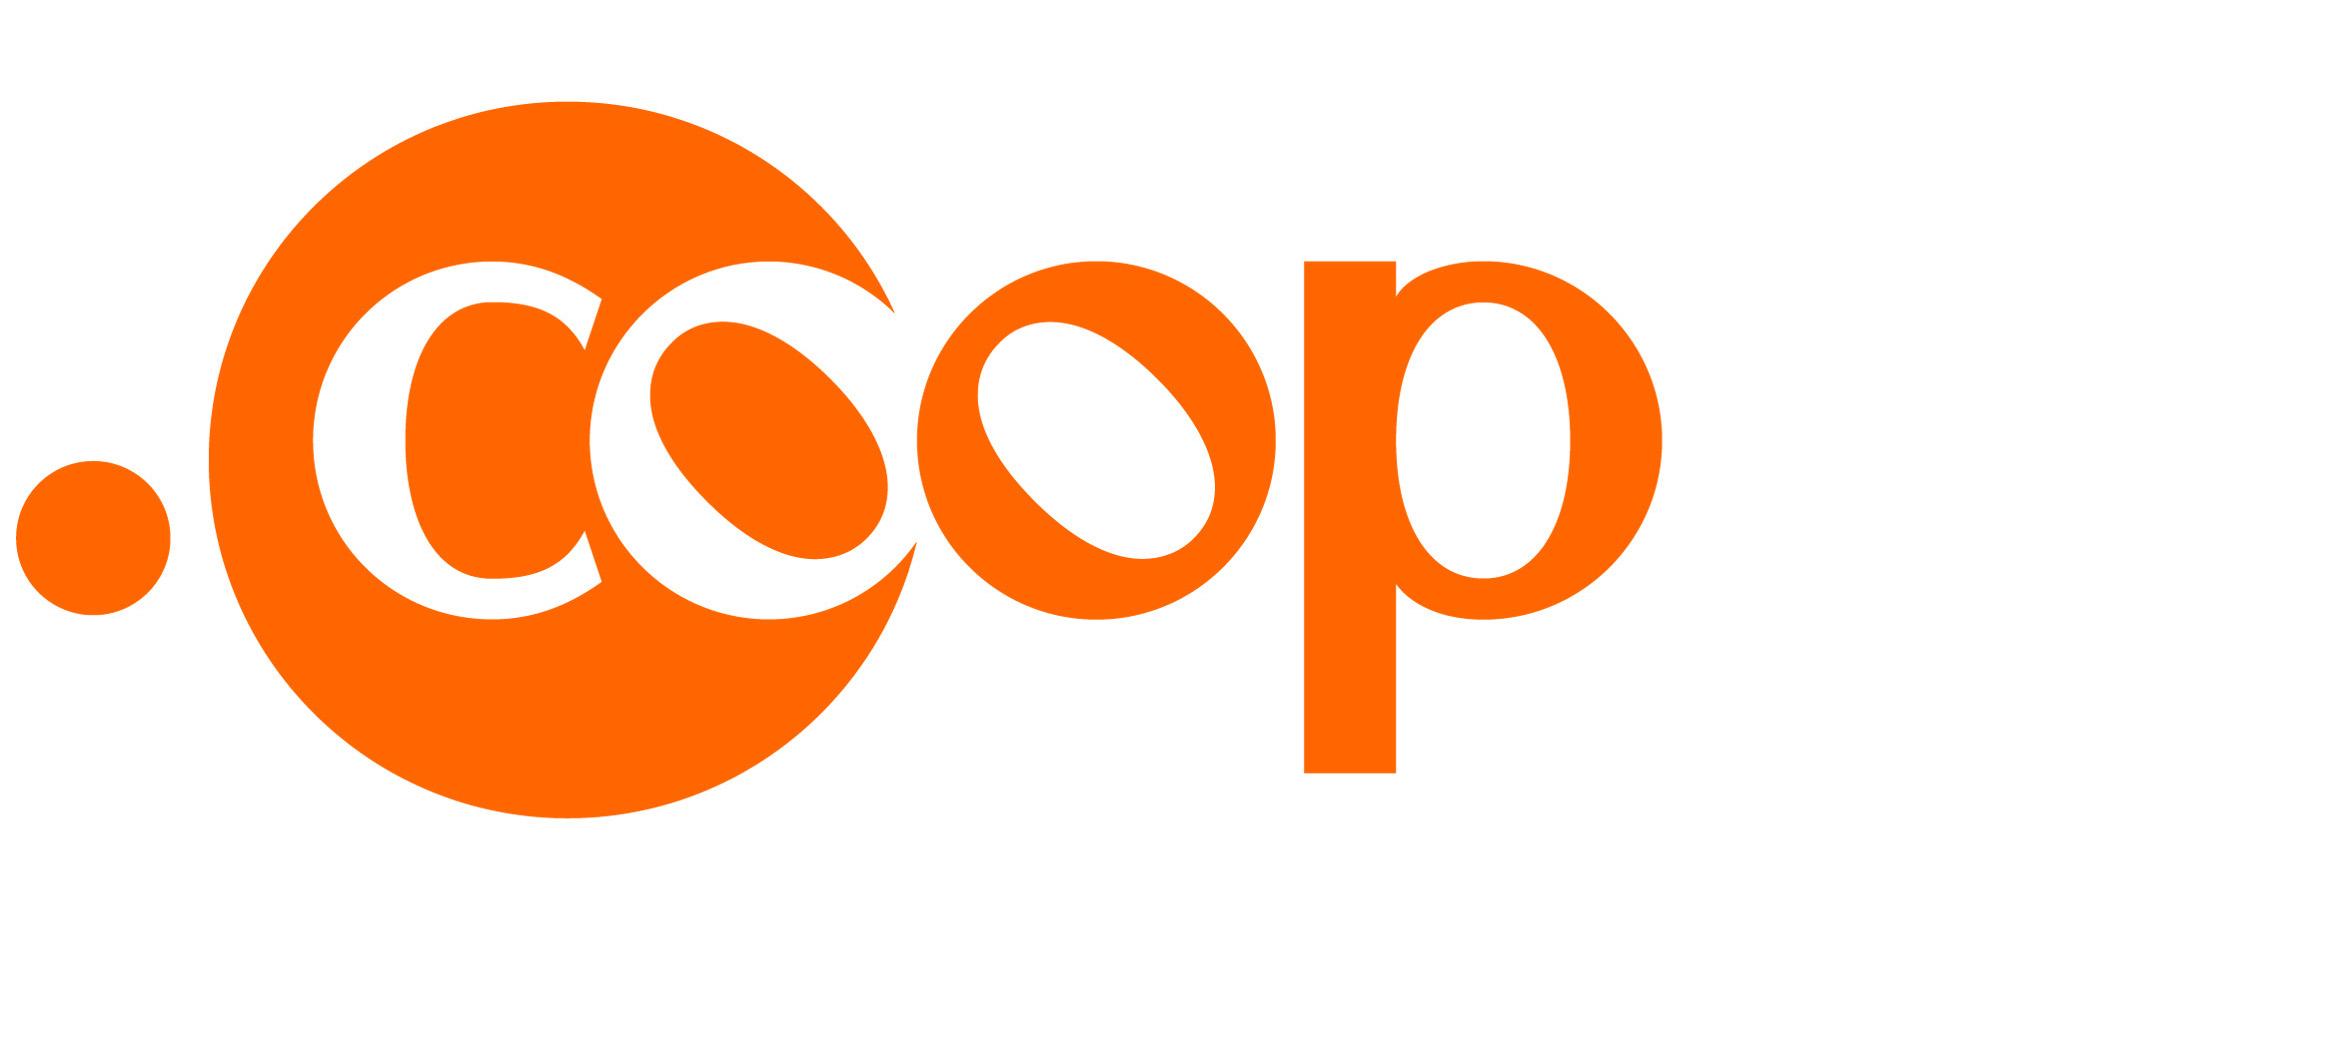 Dot Coop